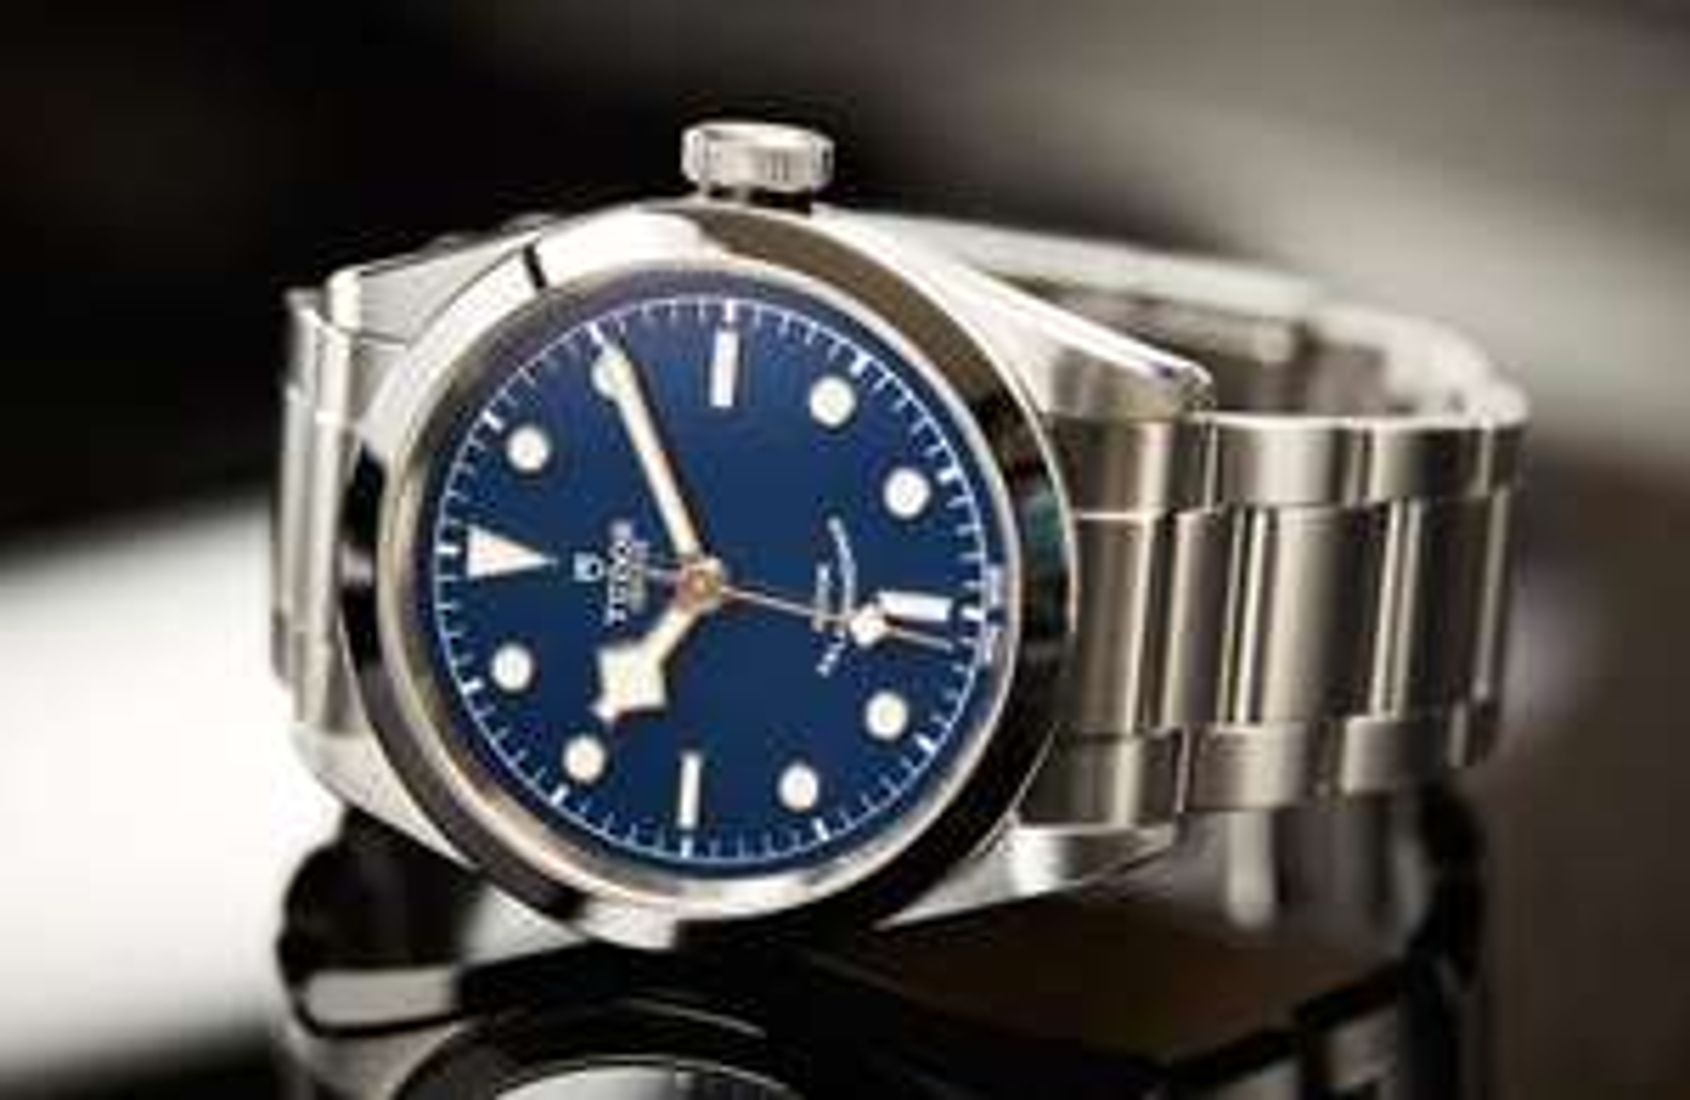 Tudor Heritage Black Bay 41 Blau Automatikuhr Herren - Swiss Made Luxusuhr